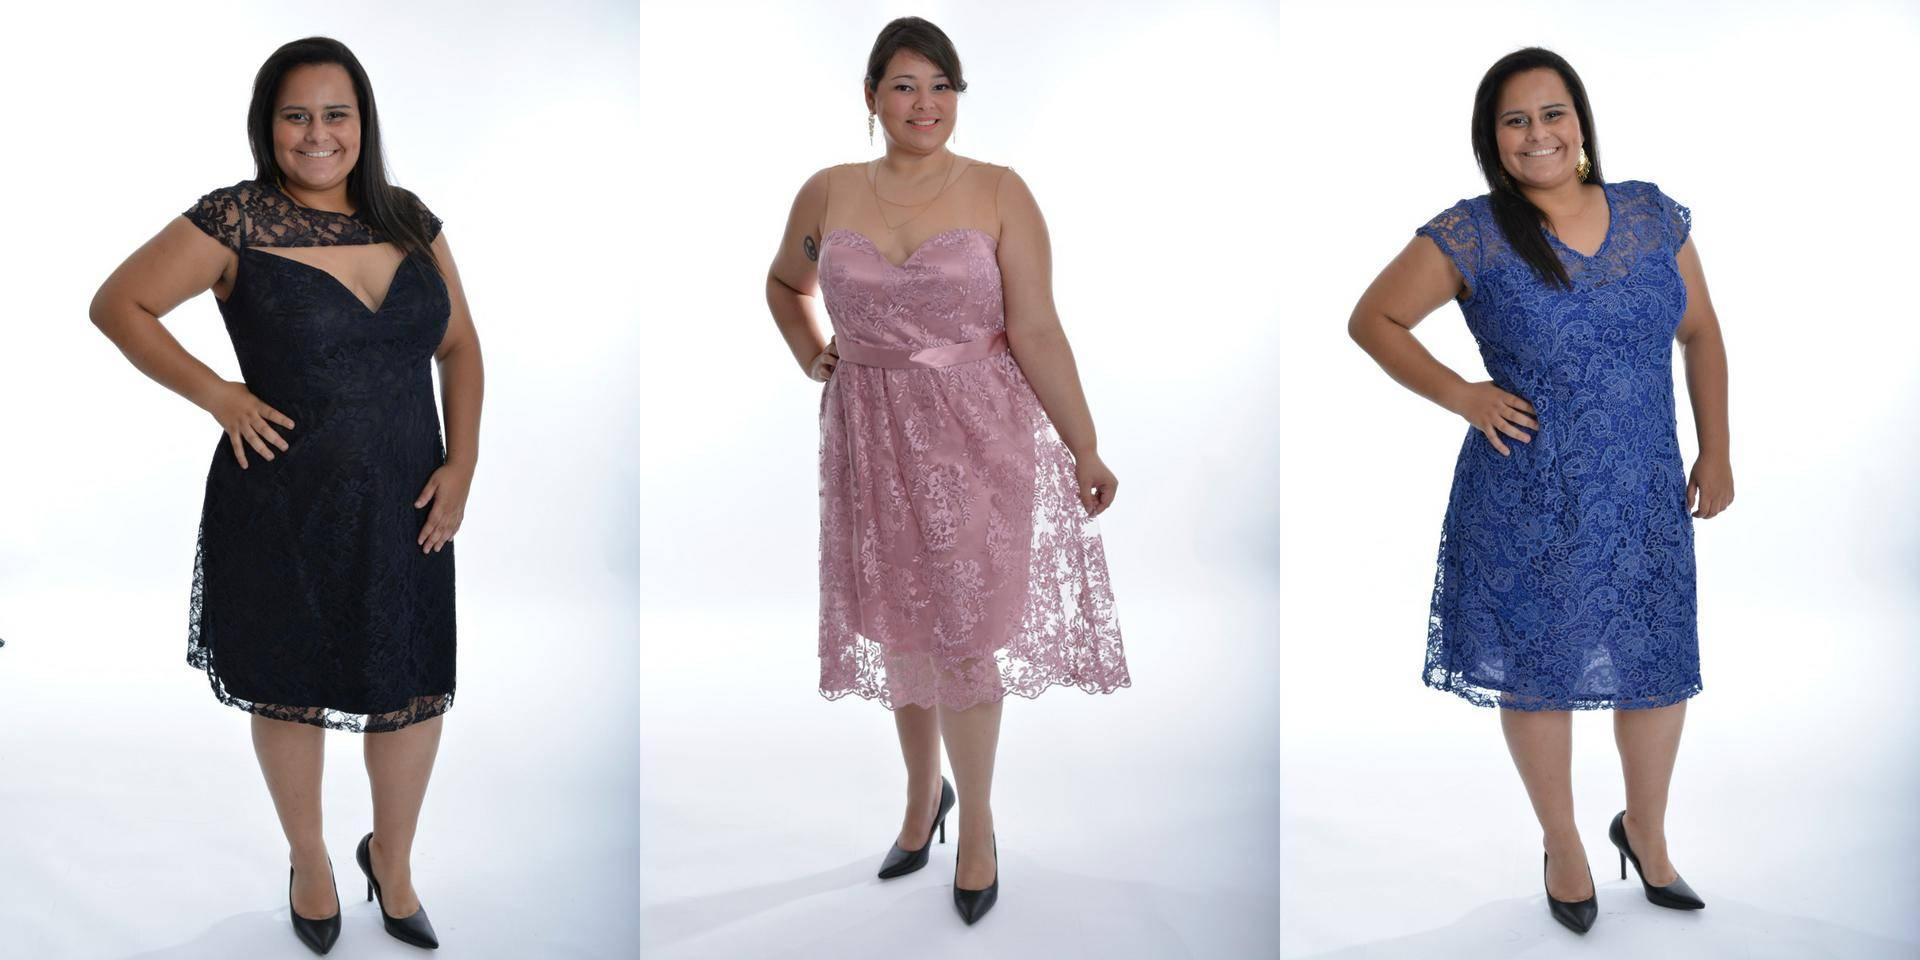 Comprar vestidos de festa nos estados unidos